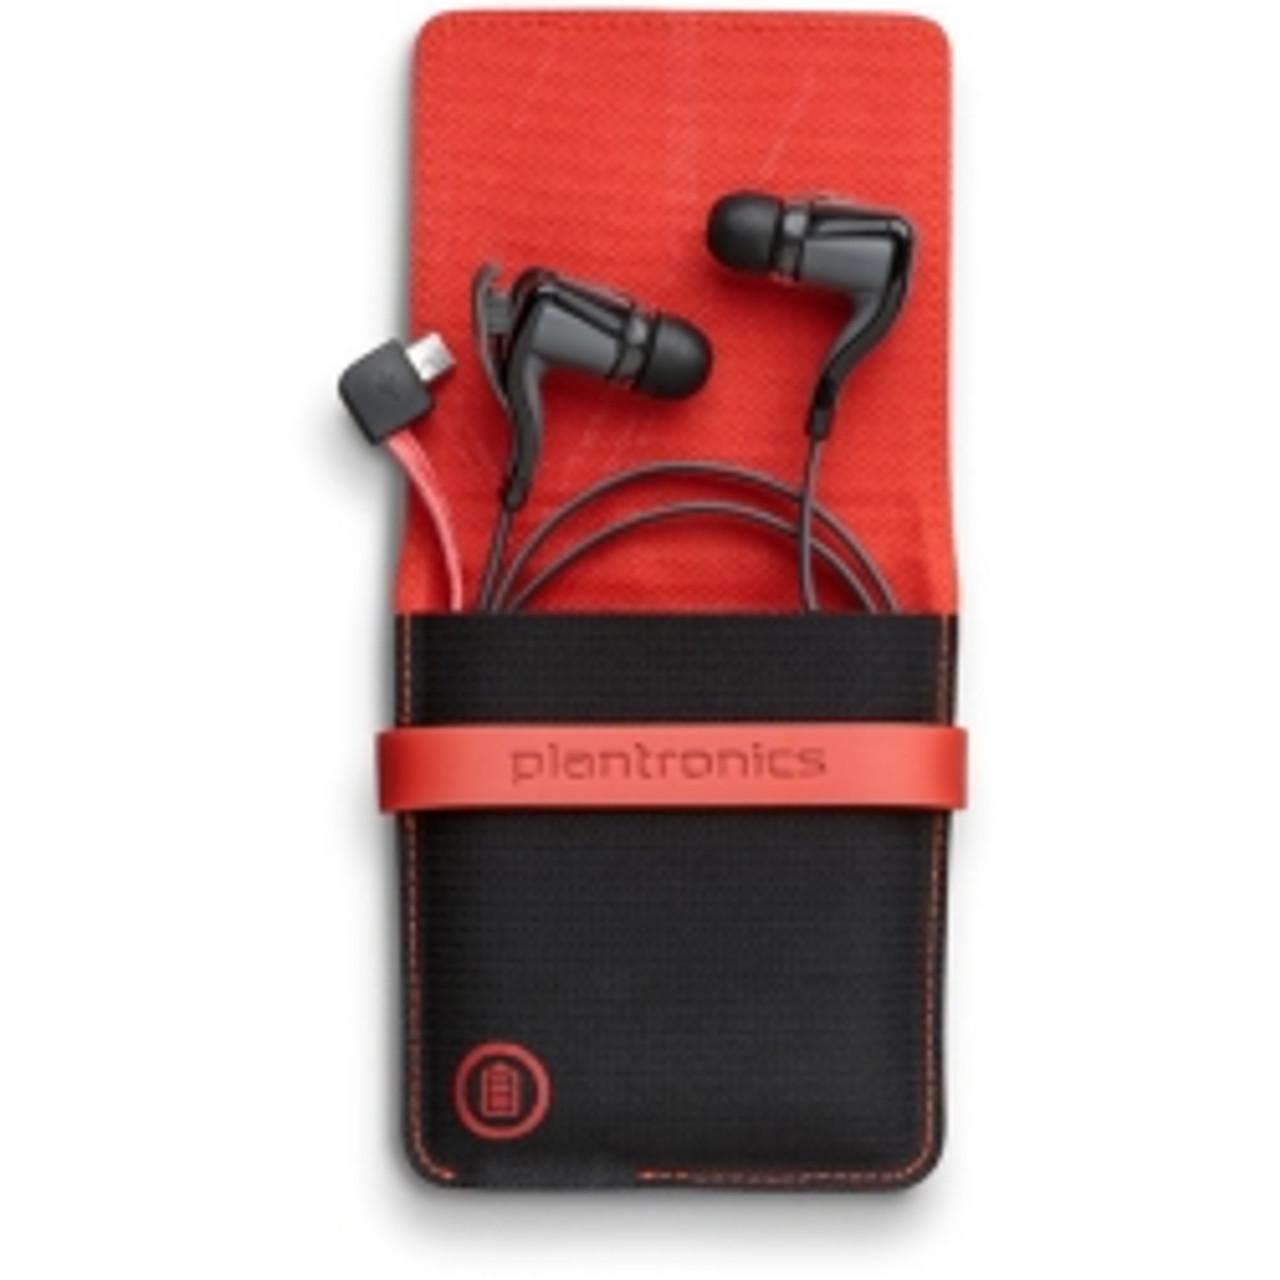 Plantronics Backbeat Go 2 In Ear Only Headsets Black